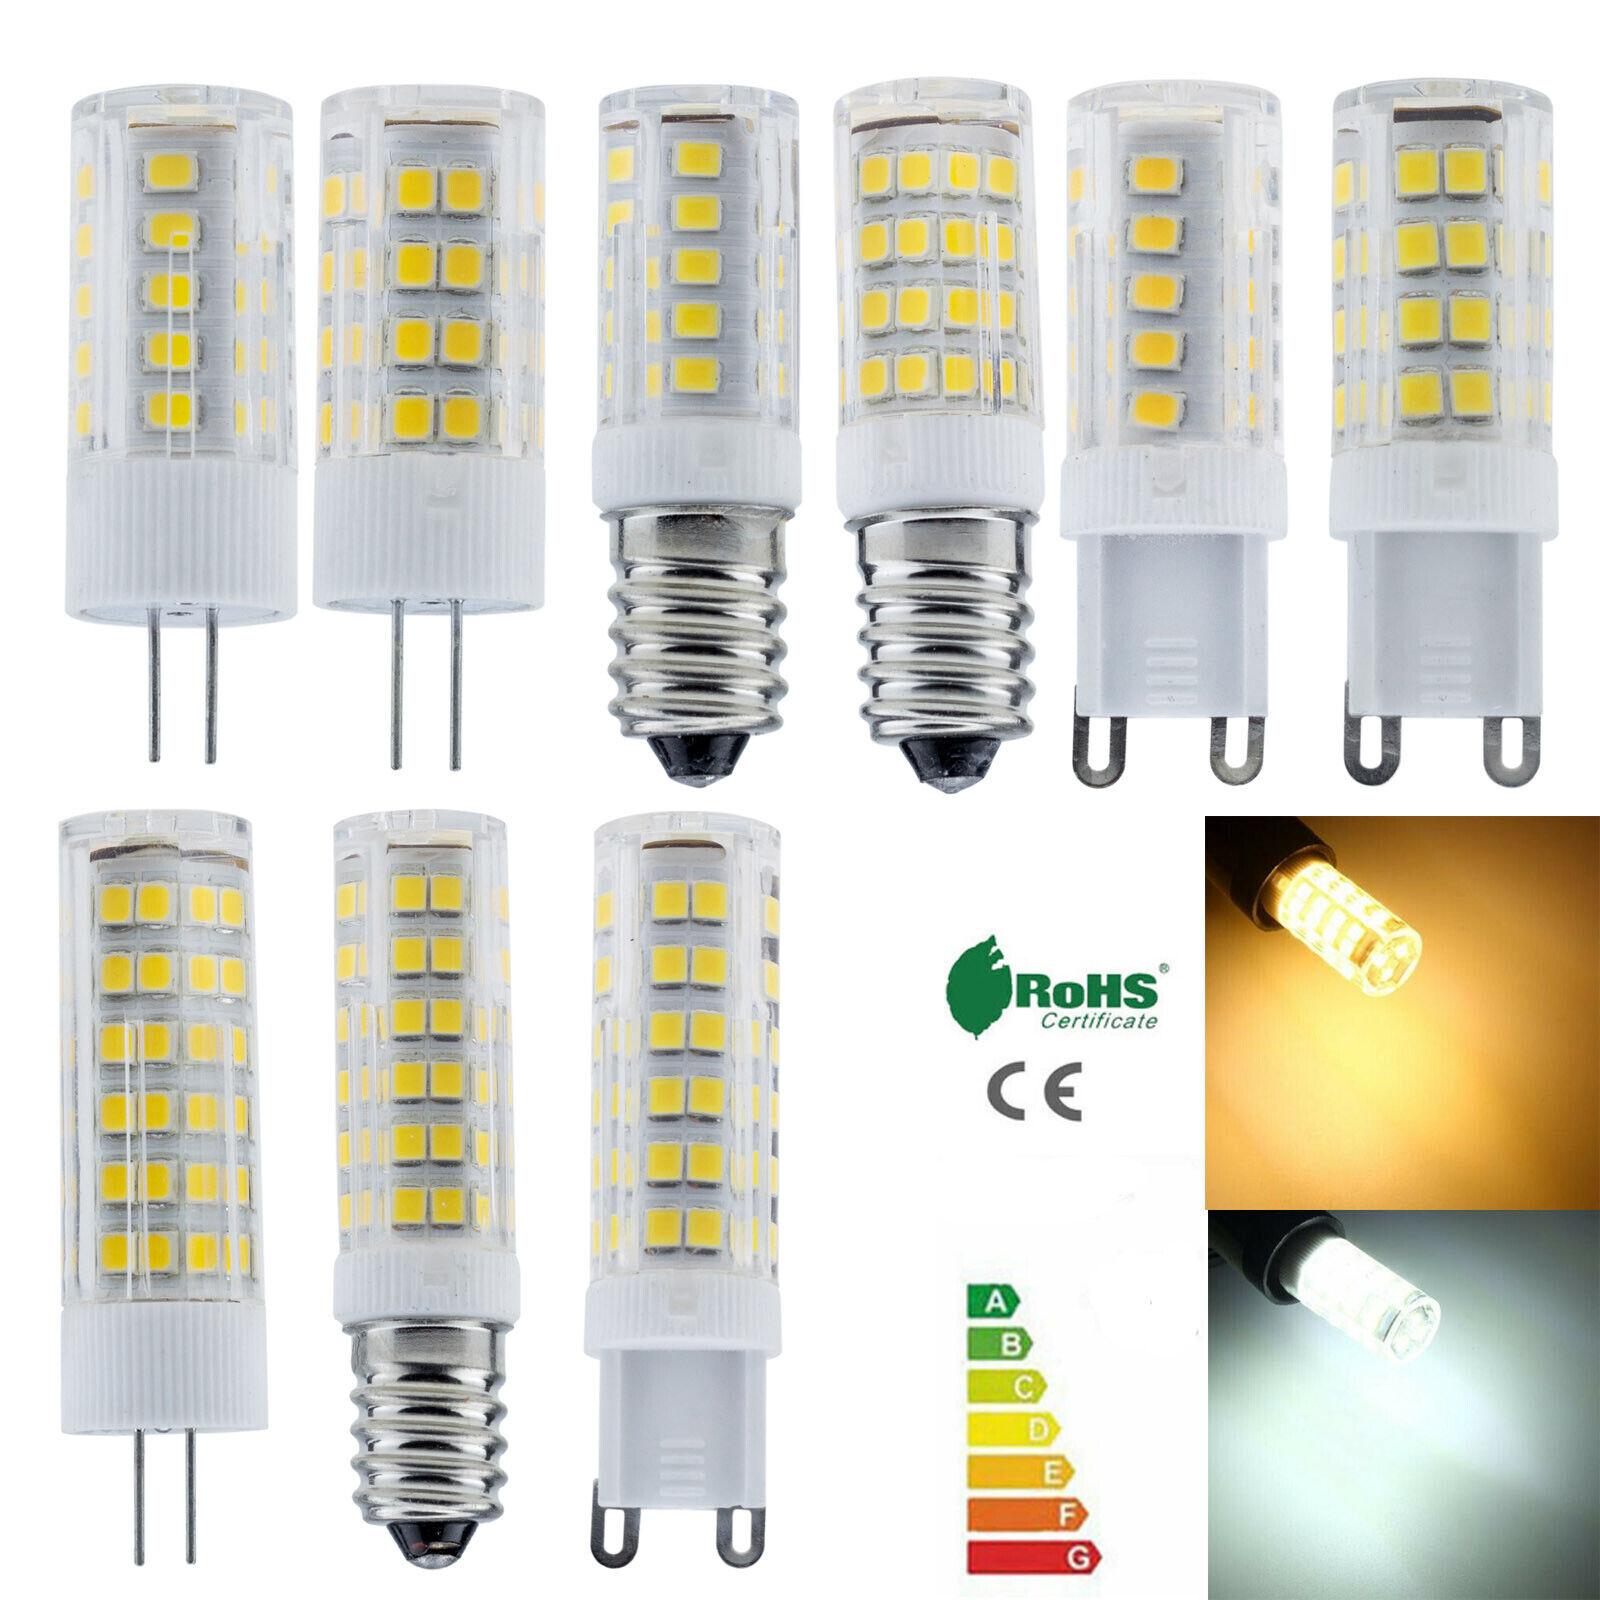 G4 G9 E14 5W 8W 12W Ceramics LED Corn Bulbs Capsule Crystal Lights White Lamp RC